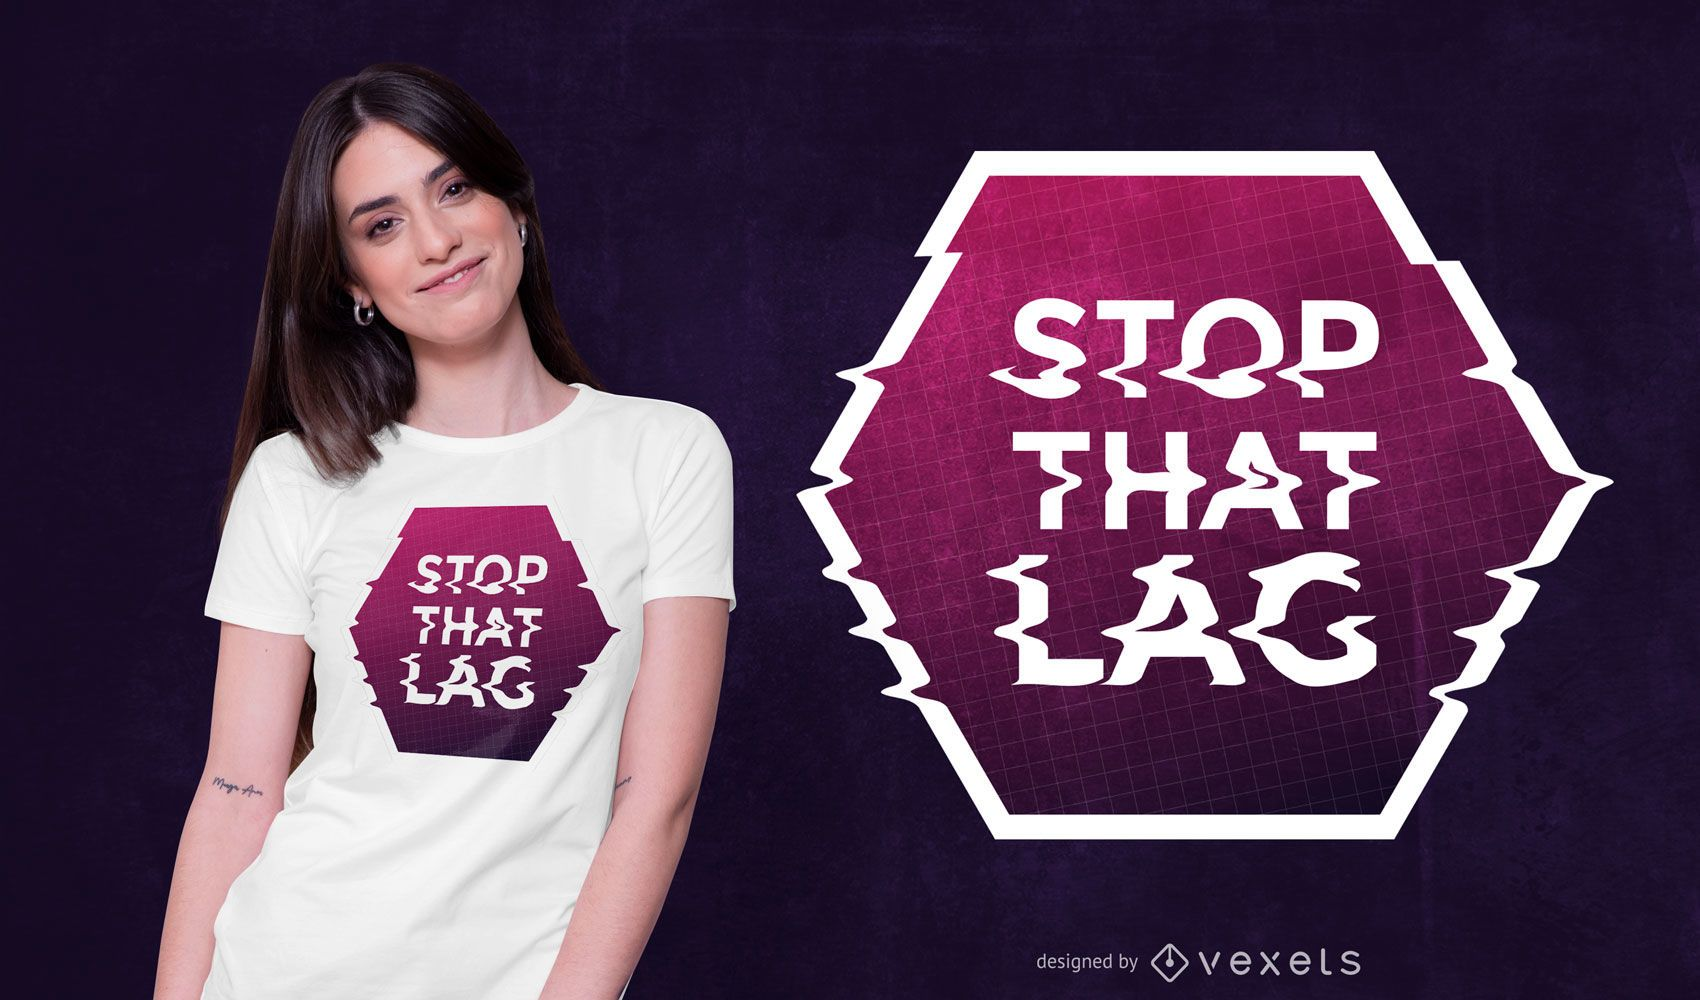 Stop That Lag T-shirt Design